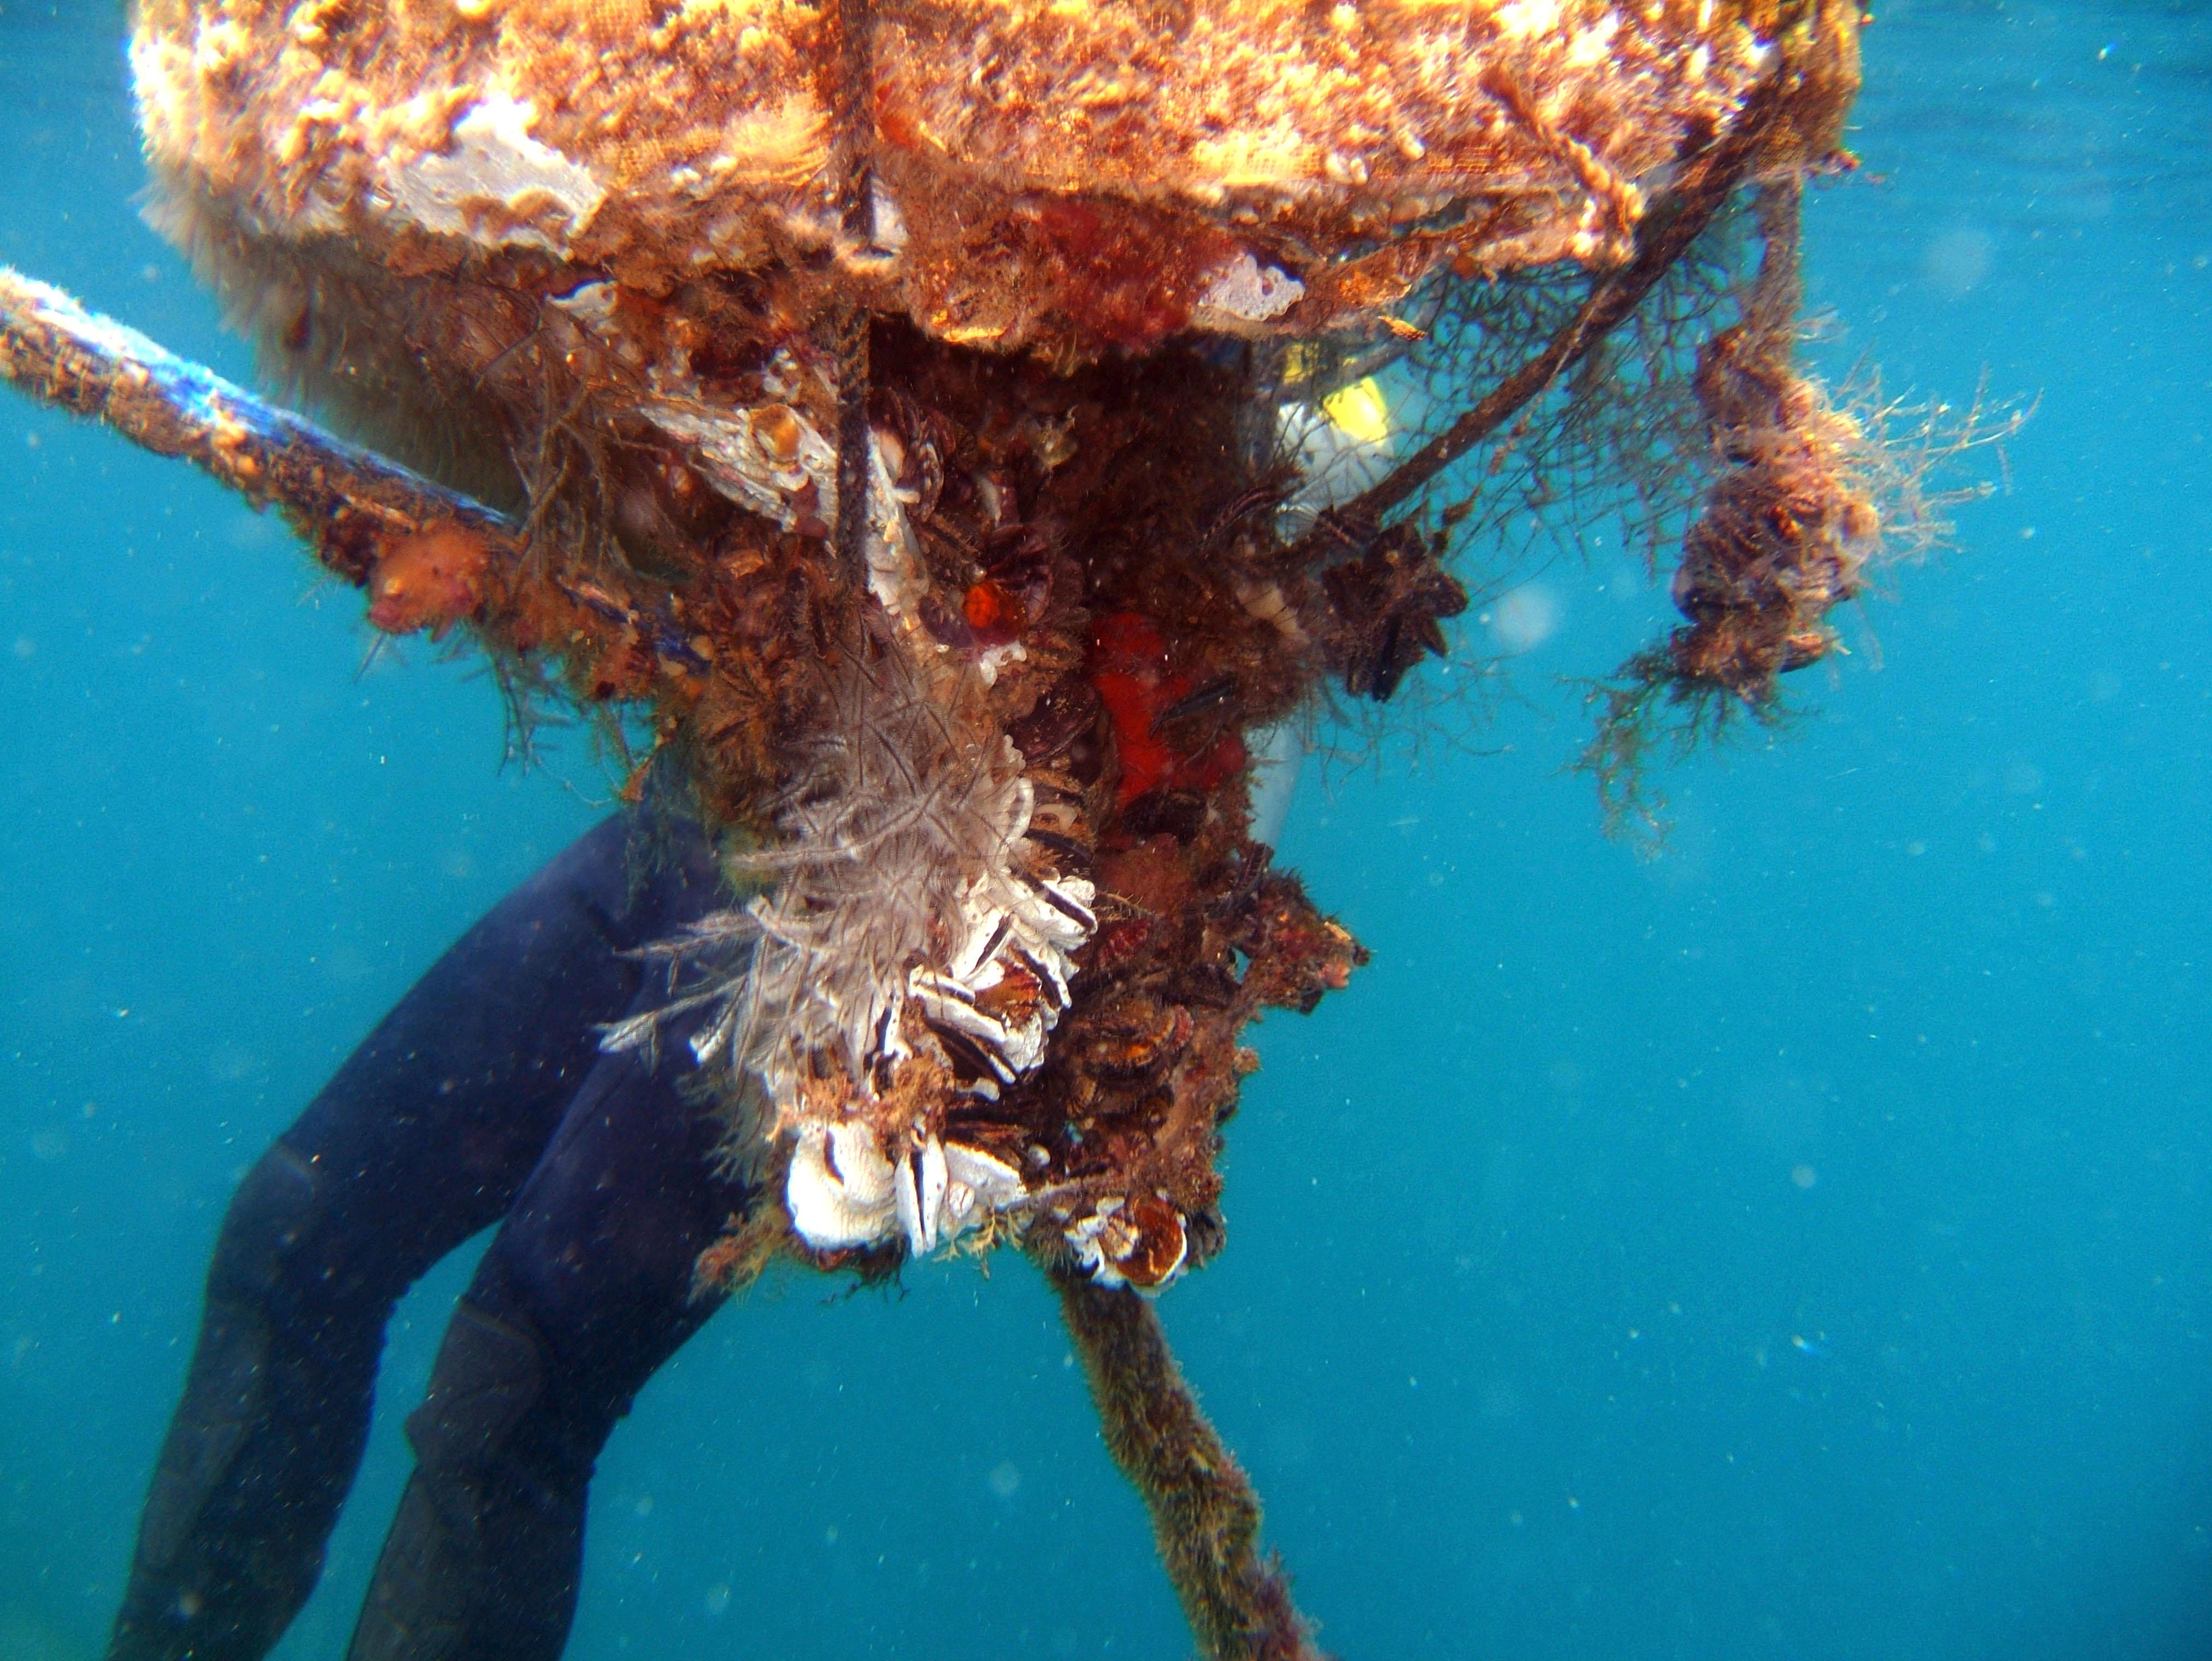 Coron dive site 3 Wreck dive IJN Akitushima July 2005 01